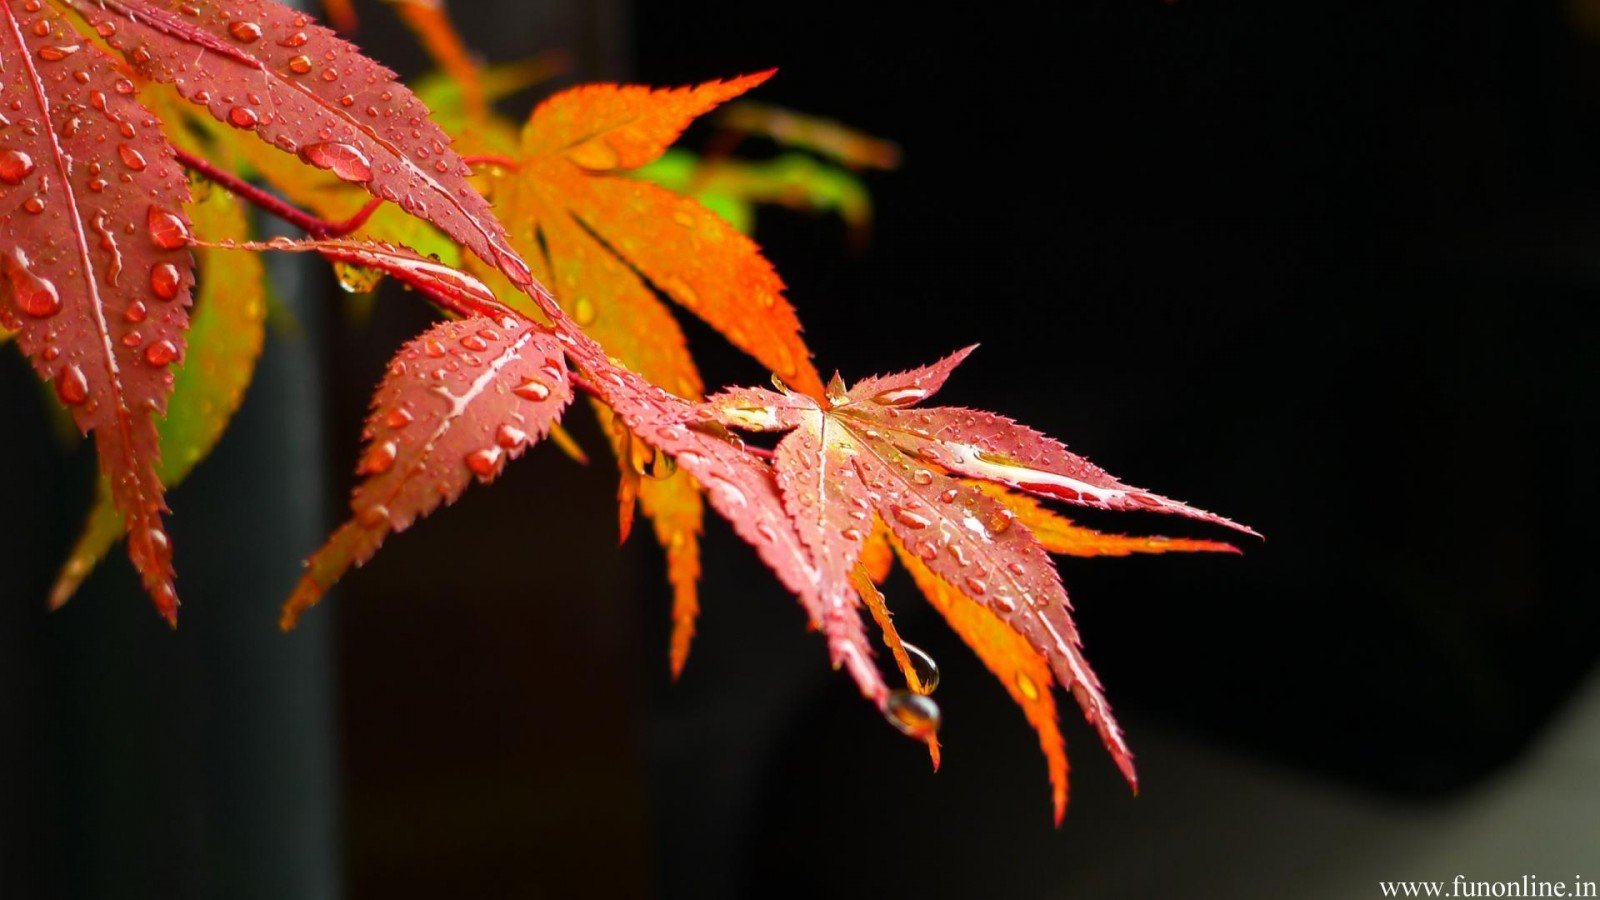 Autumn Falling Leaves Live Wallpaper Beautiful Wallpapers Rainfall Wallpaper